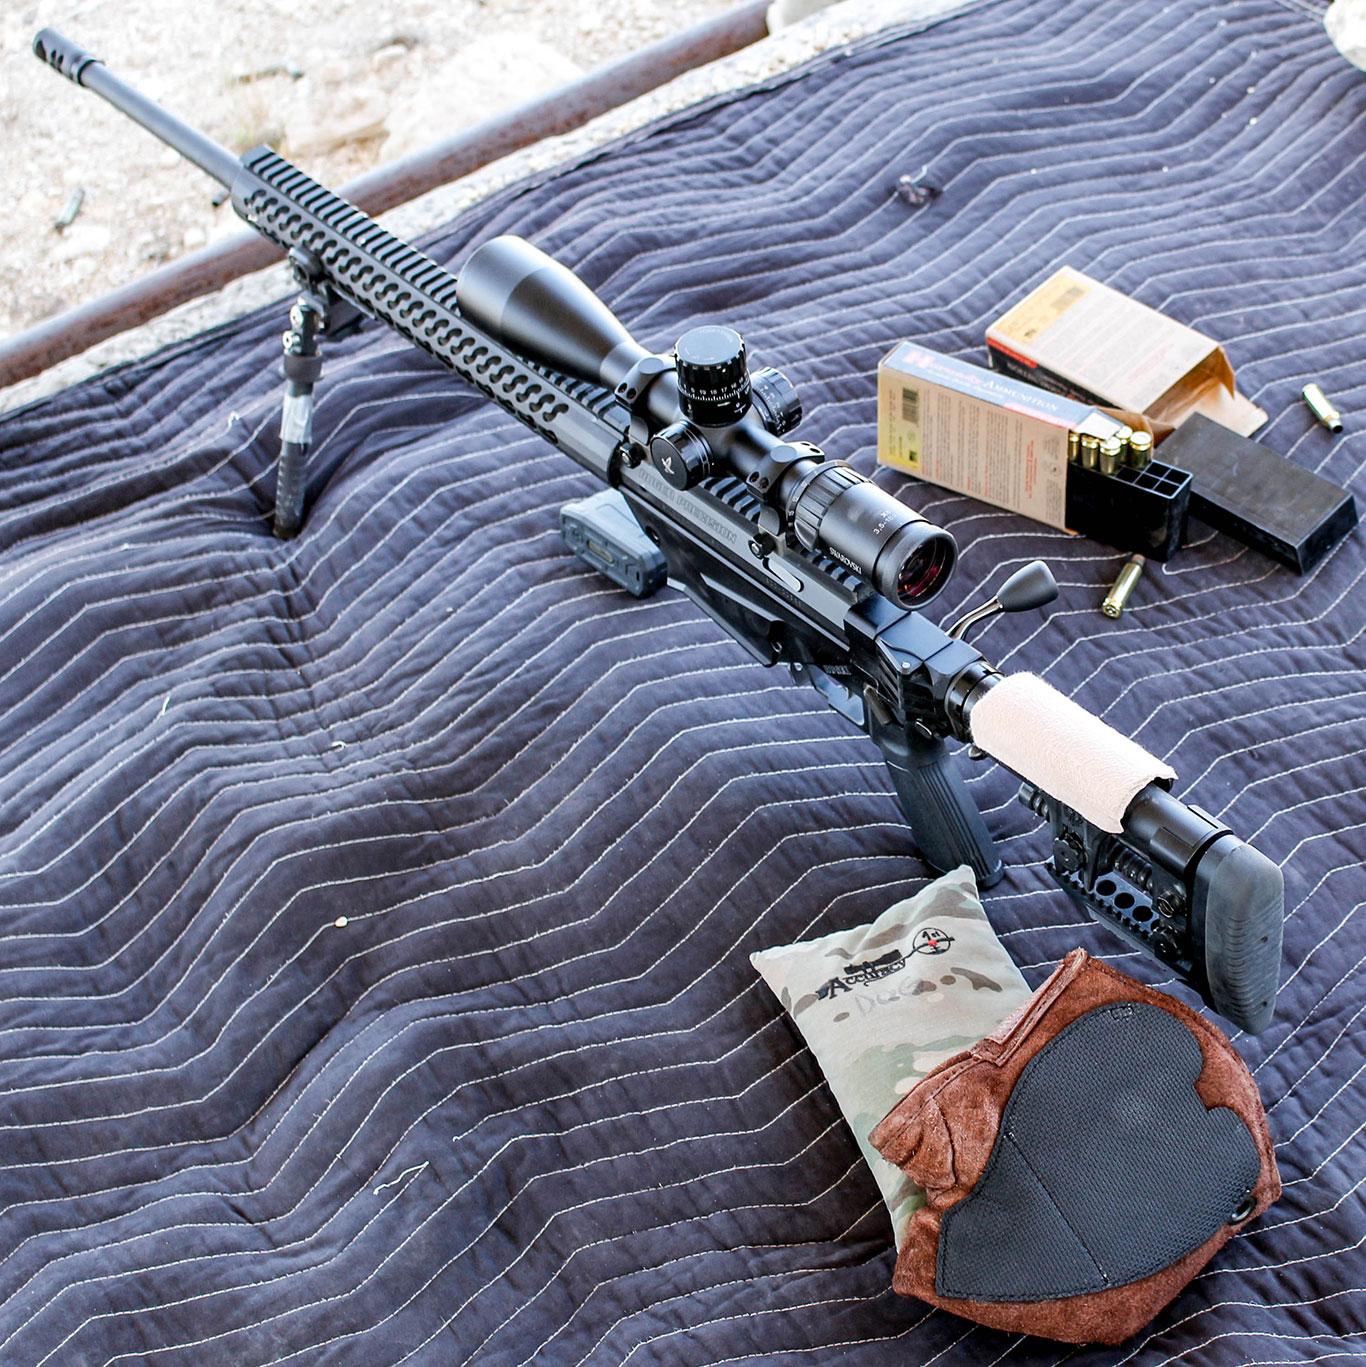 https://files.osgnetworks.tv/10/files/2018/08/The-Art-of-Choosing-a-New-Rifle-2.jpg